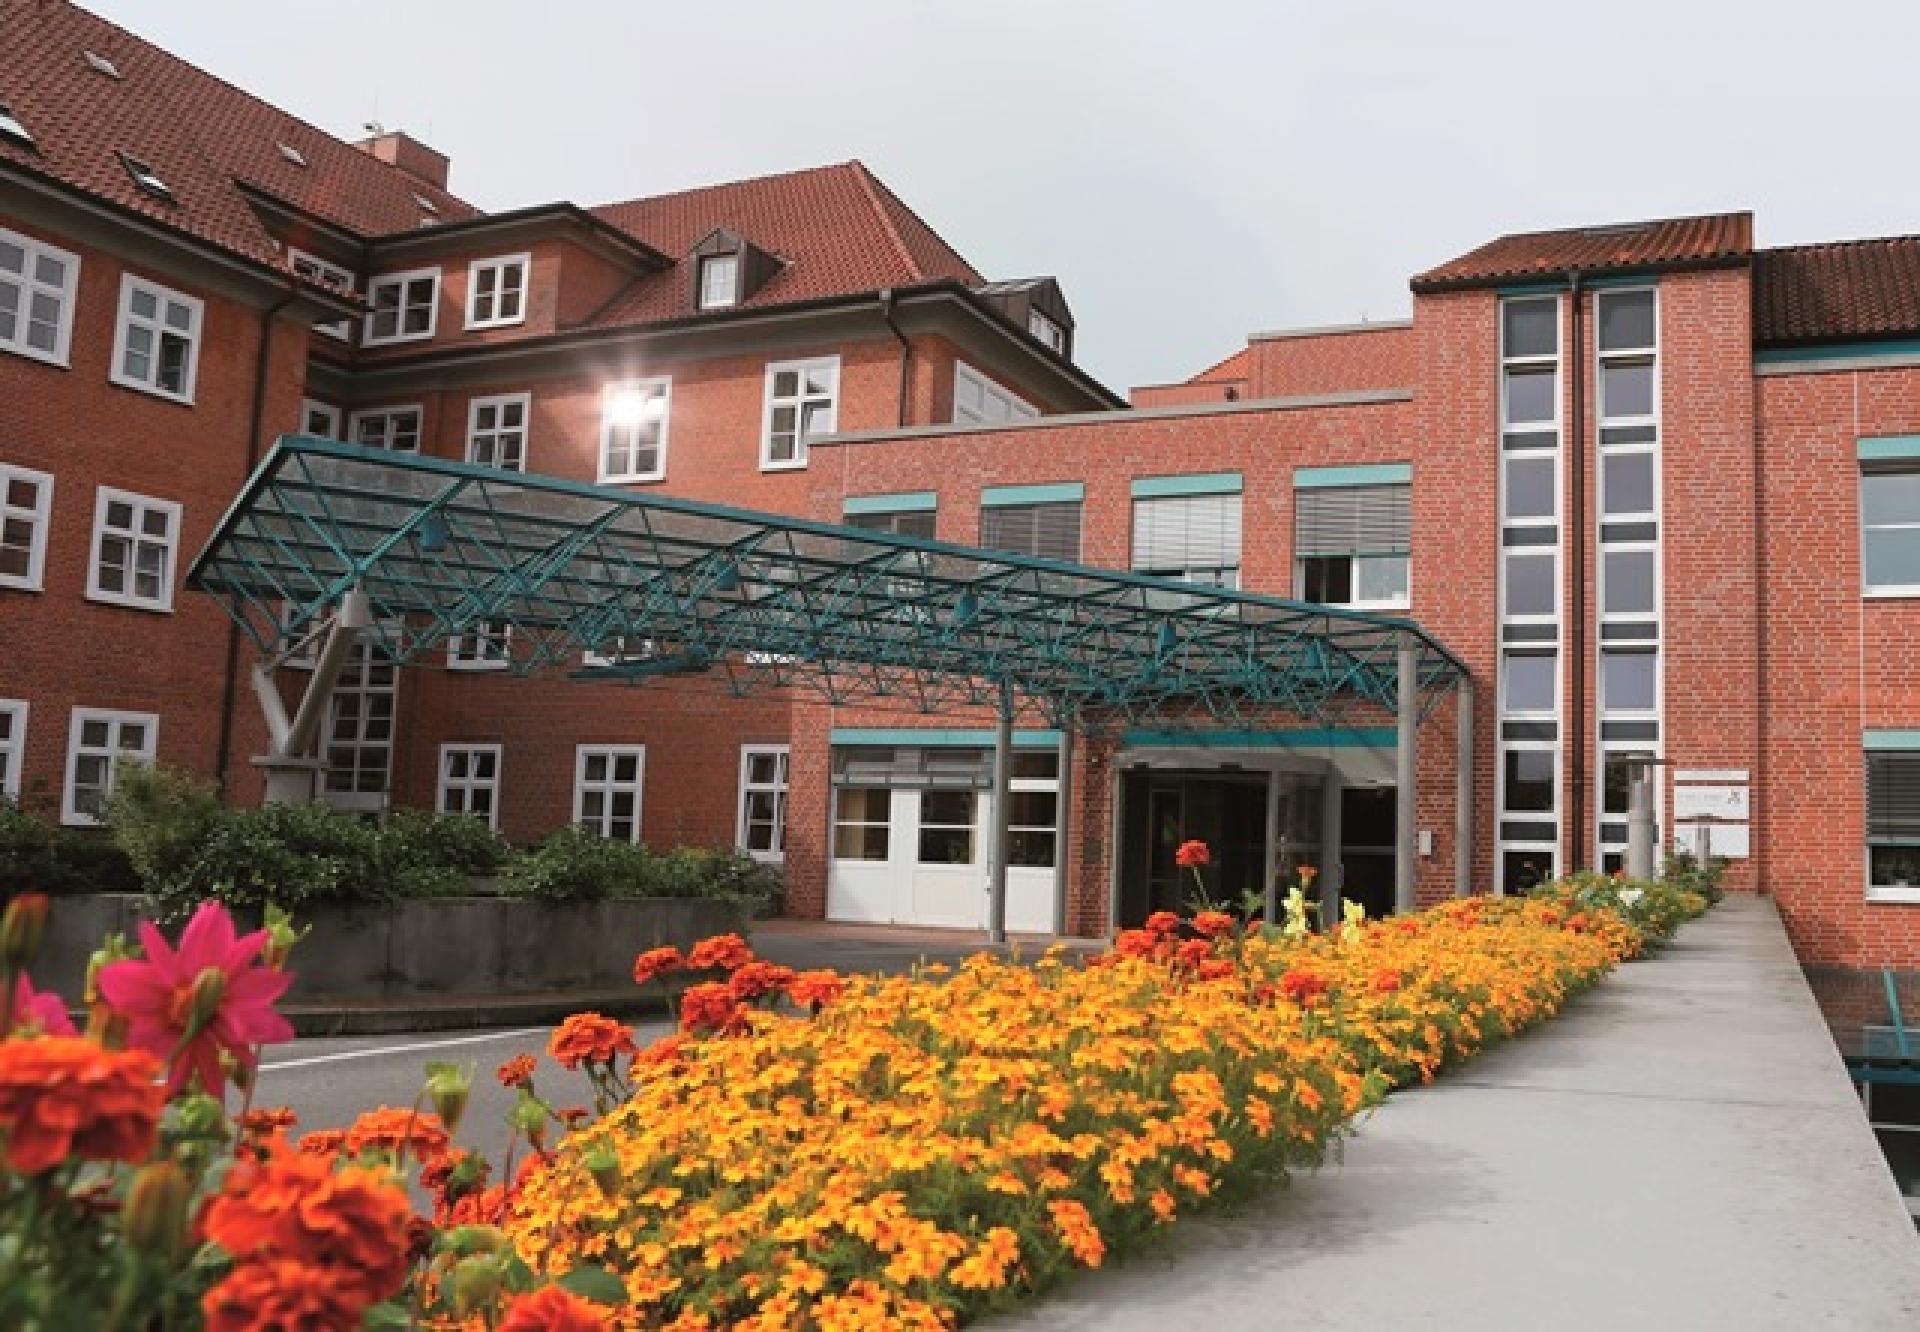 Hagenow Krankenhaus